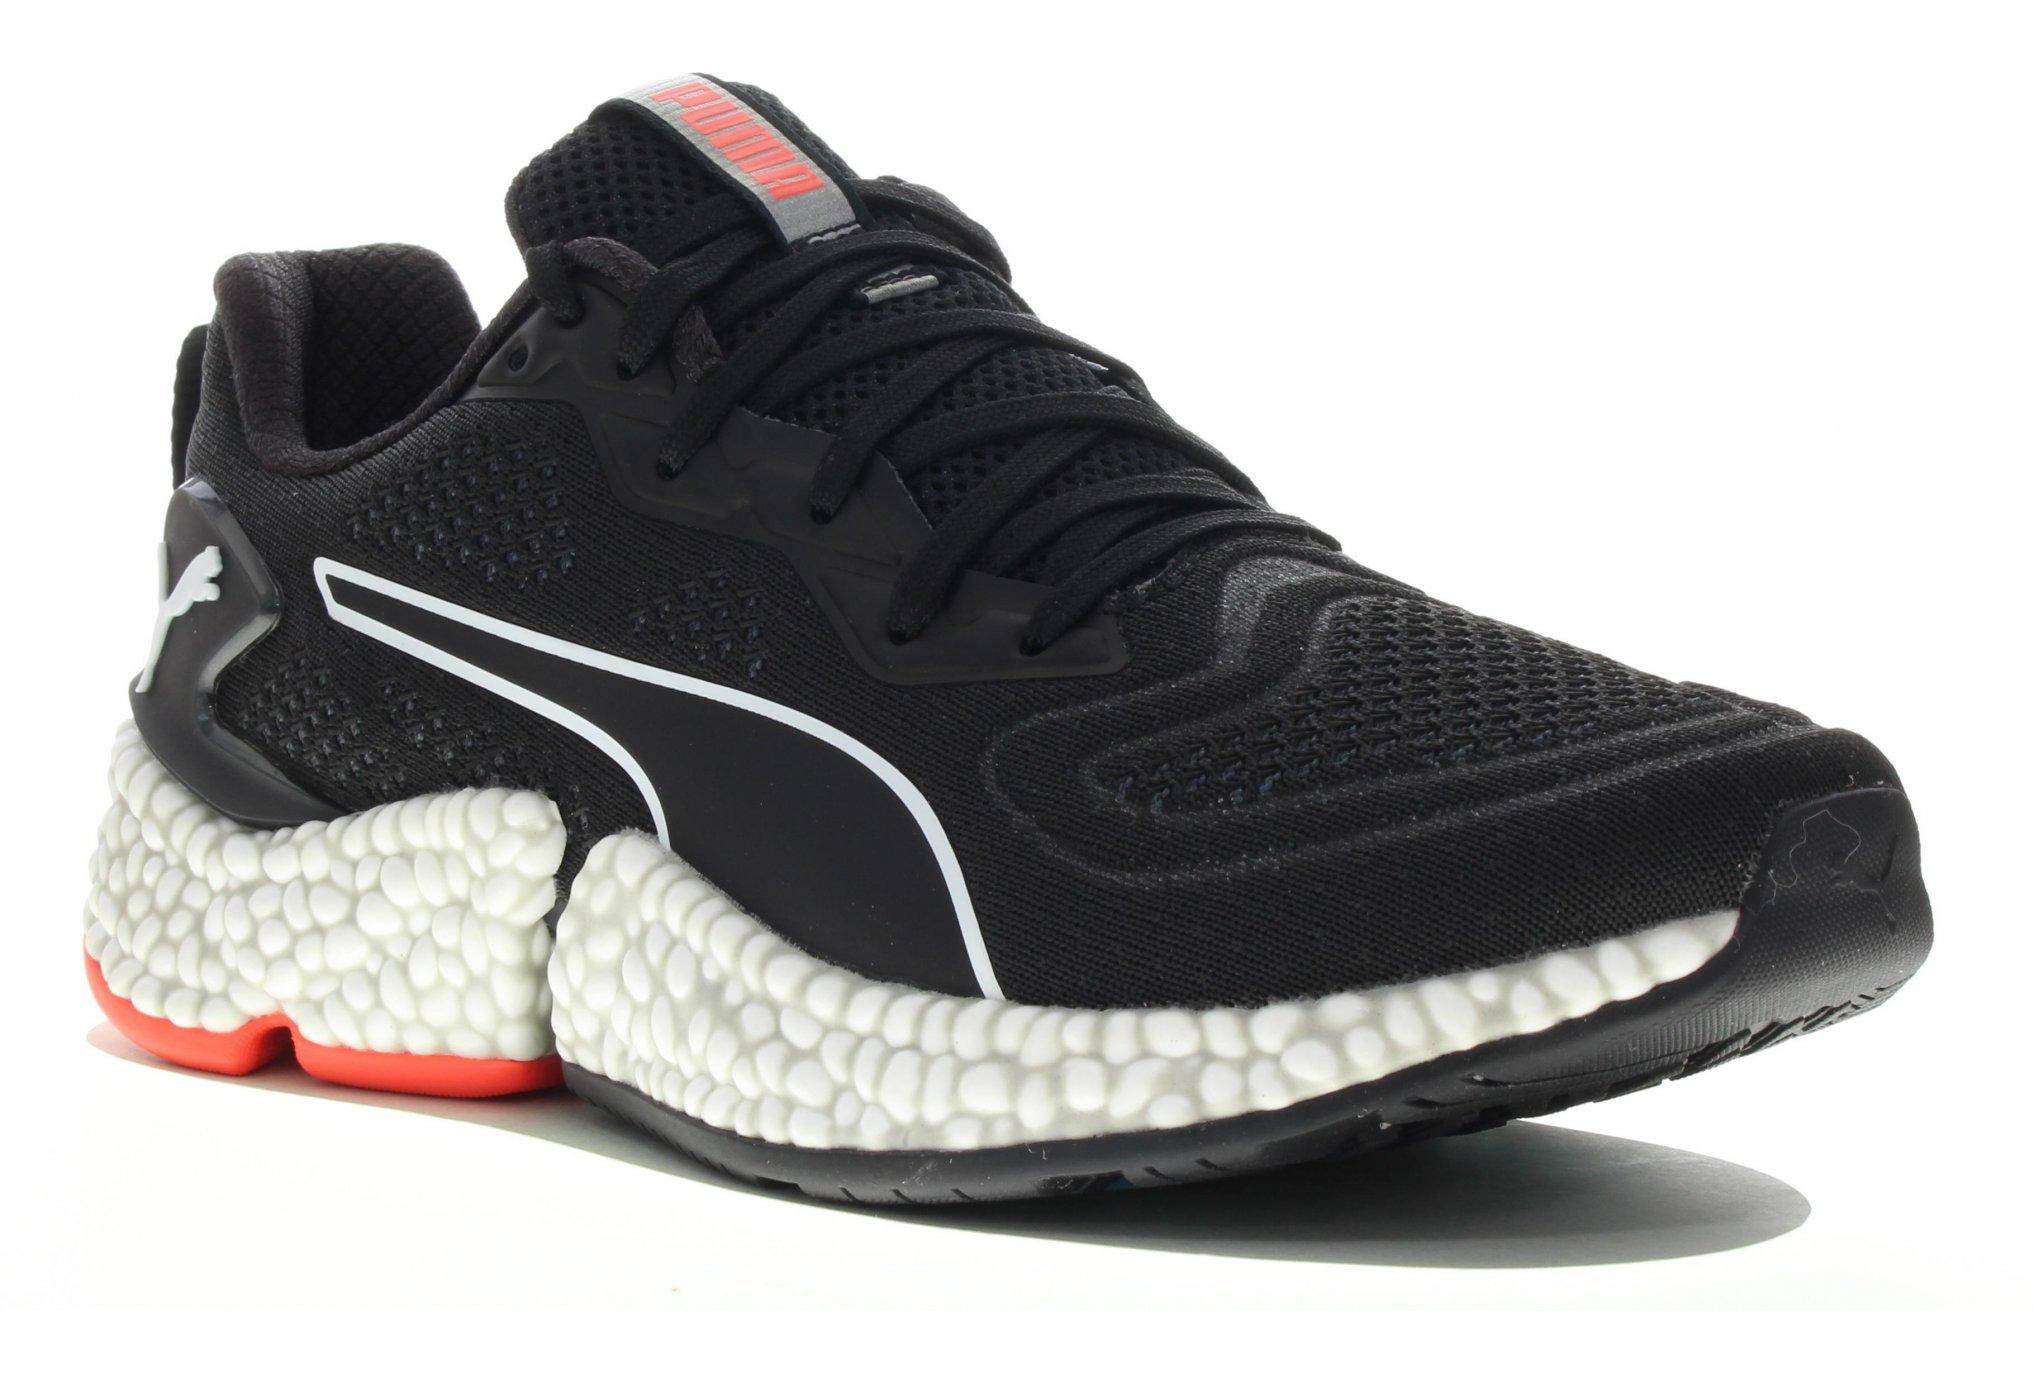 Puma Speed Orbiter W Diététique Chaussures femme